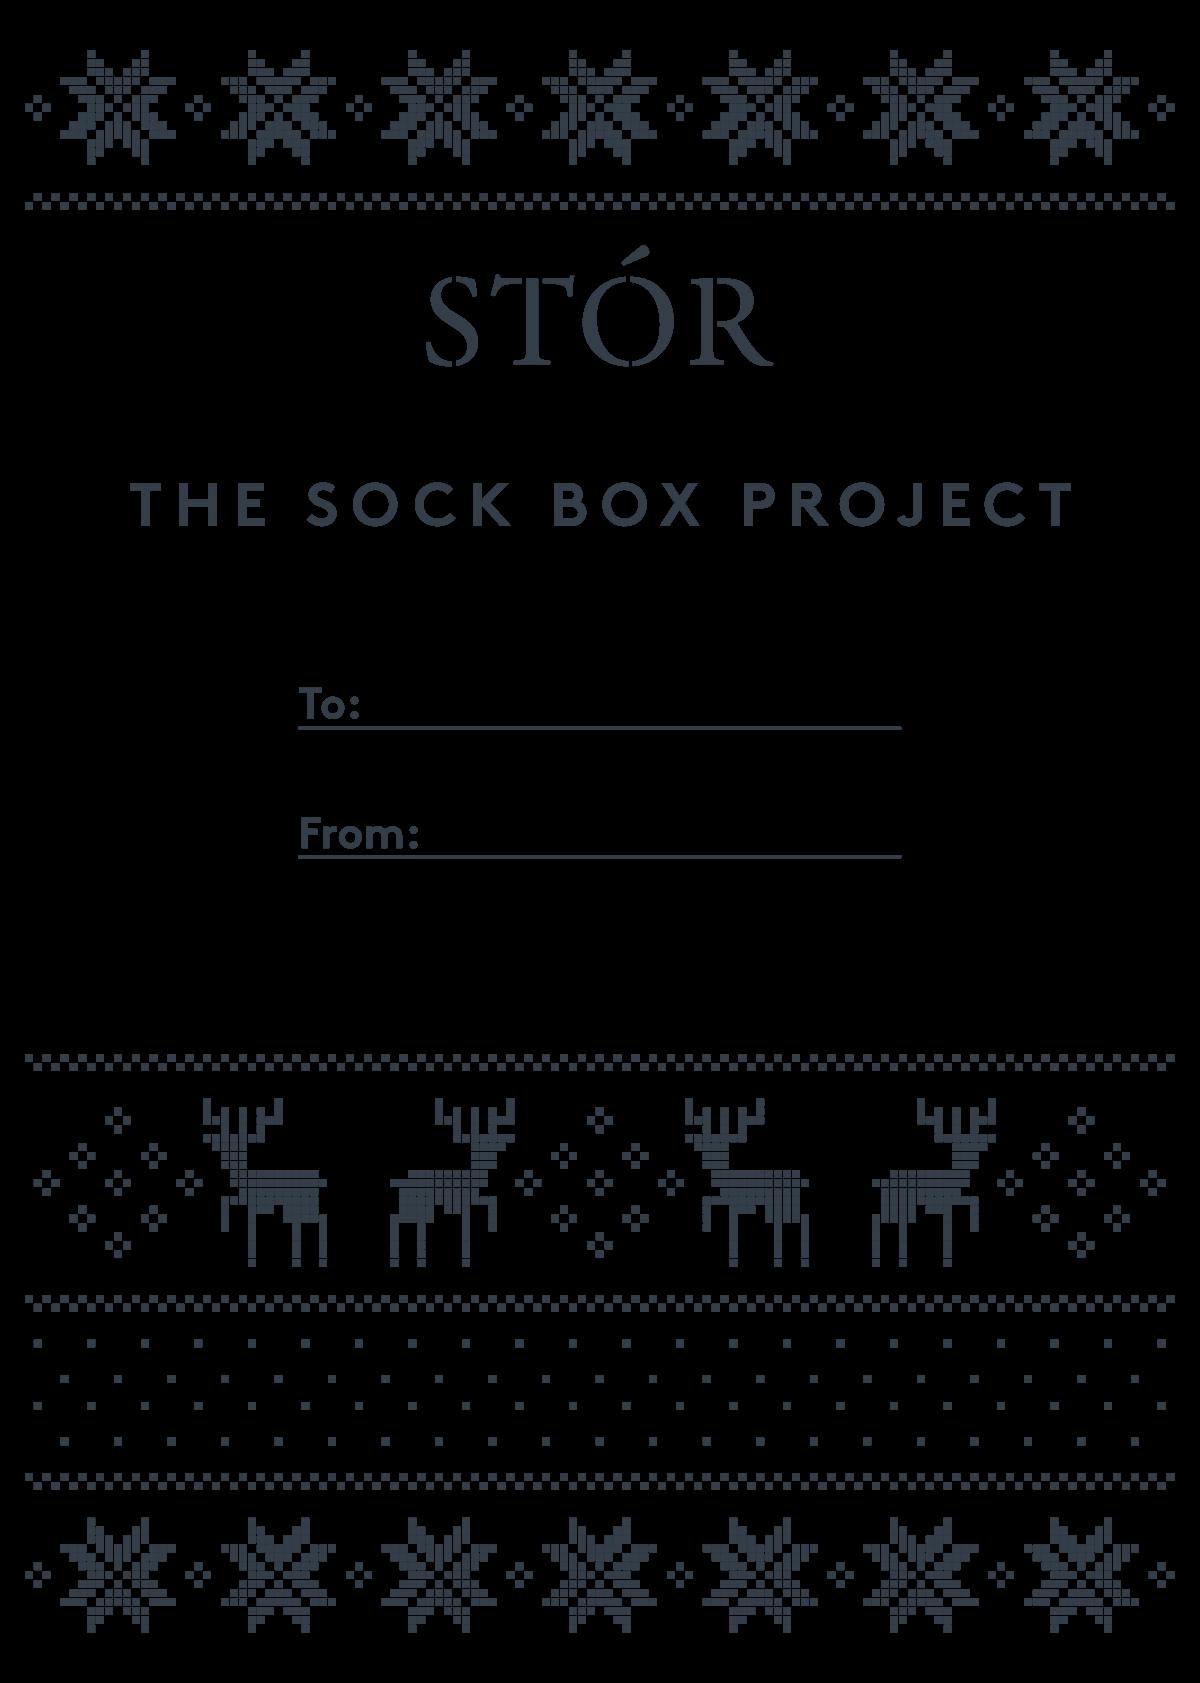 Sock Box Project